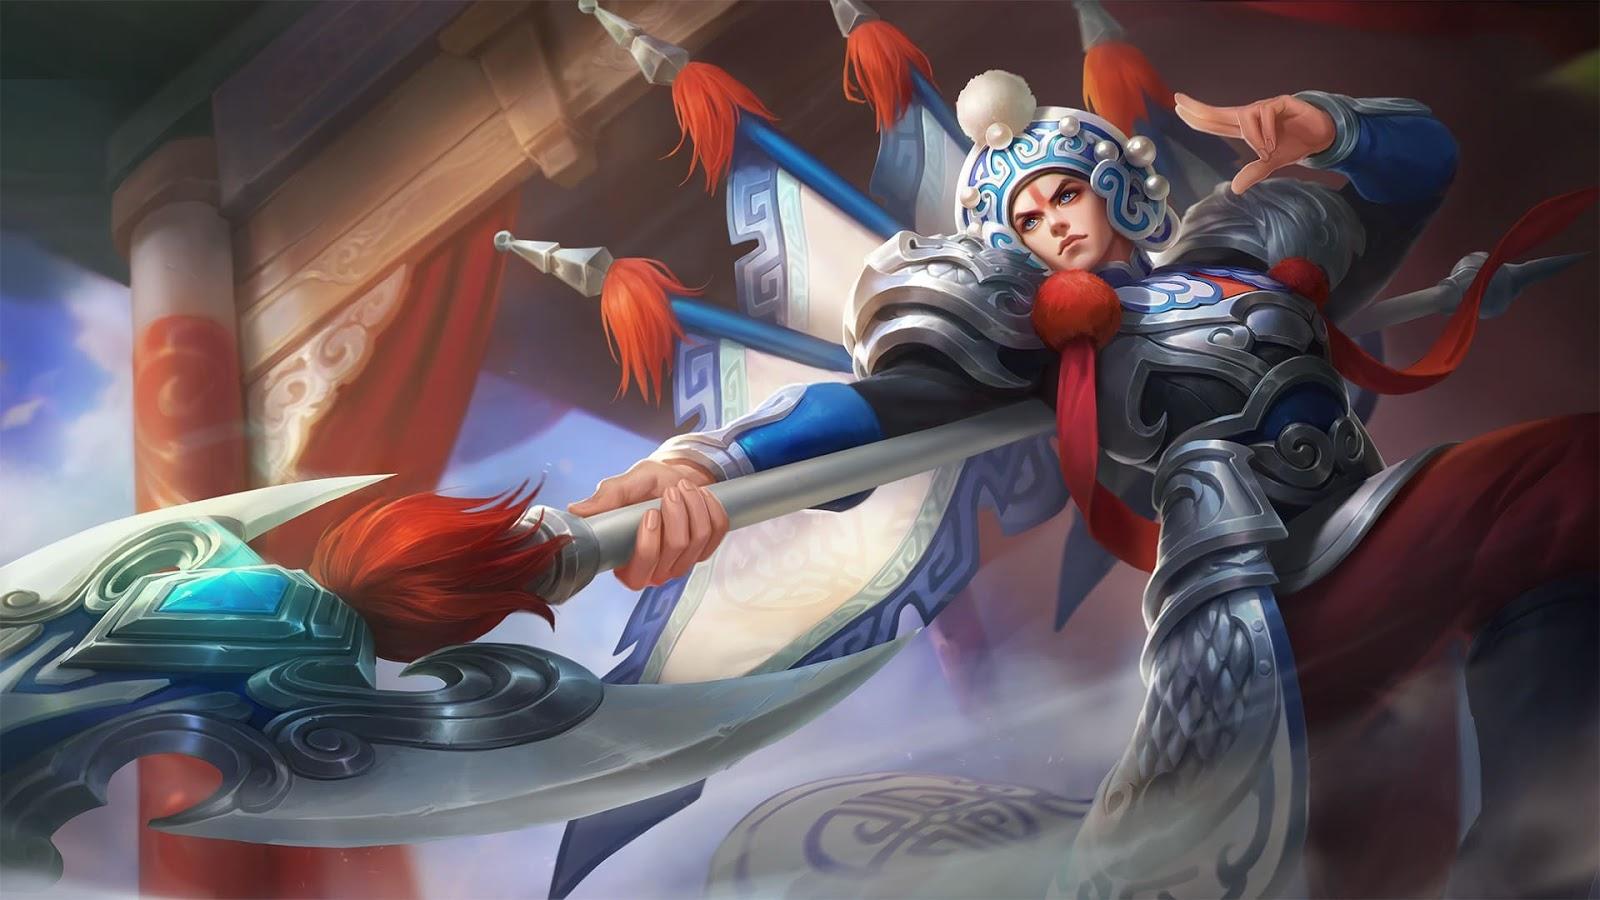 Wallpaper Zilong Changbanpo Commander Skin Mobile Legends Full HD for PC